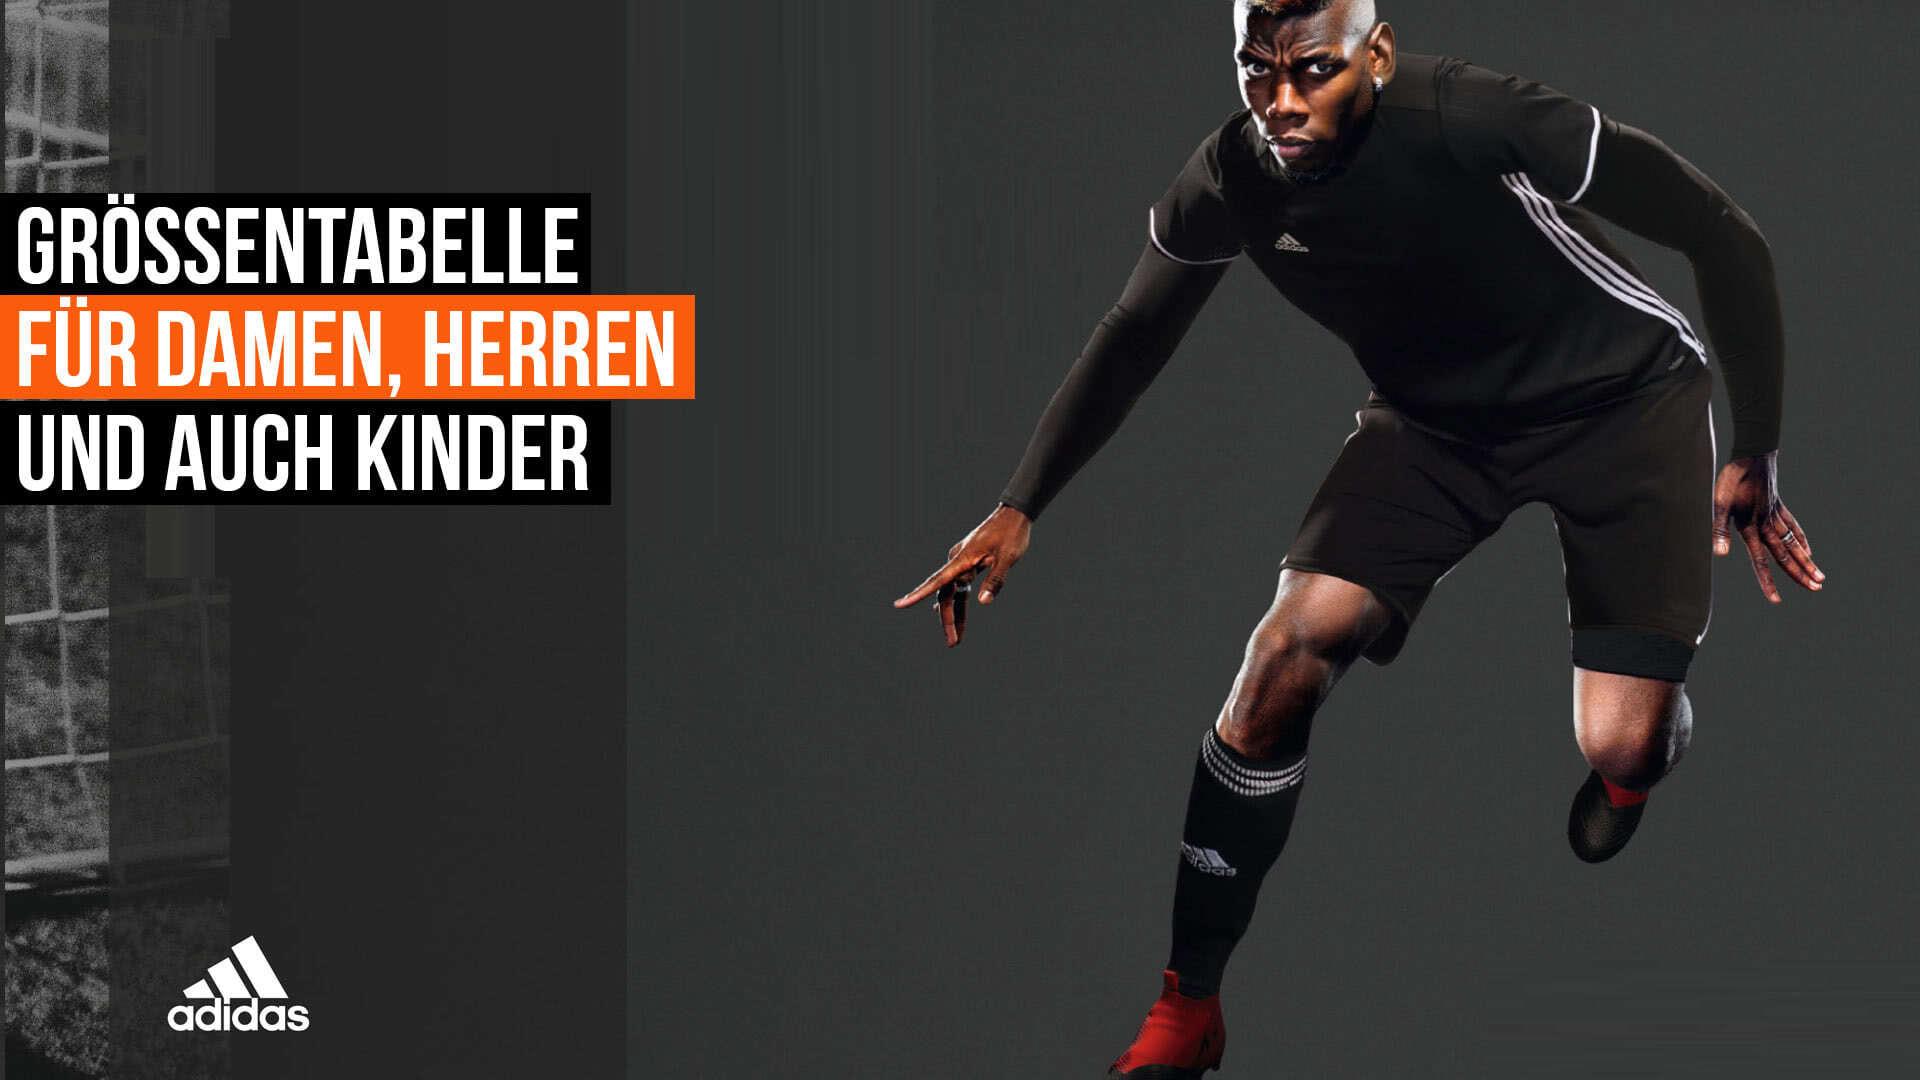 Adidas Größentabelle Damen ✓ Männer ✓ Kinder ✓